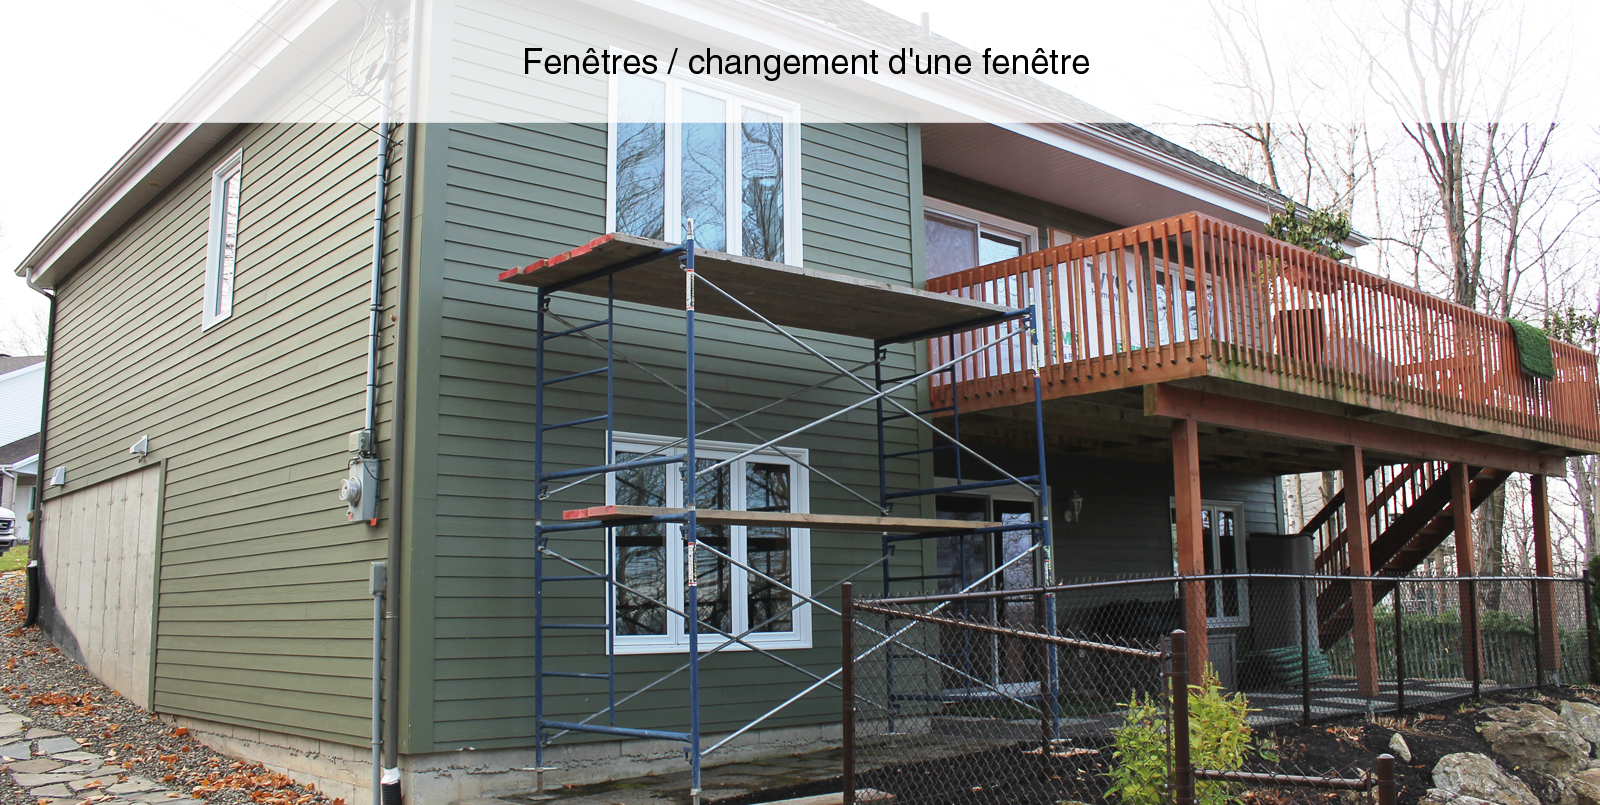 61-1-PANACHE-CONSTRUCTION-RENOVATION-FENETRES